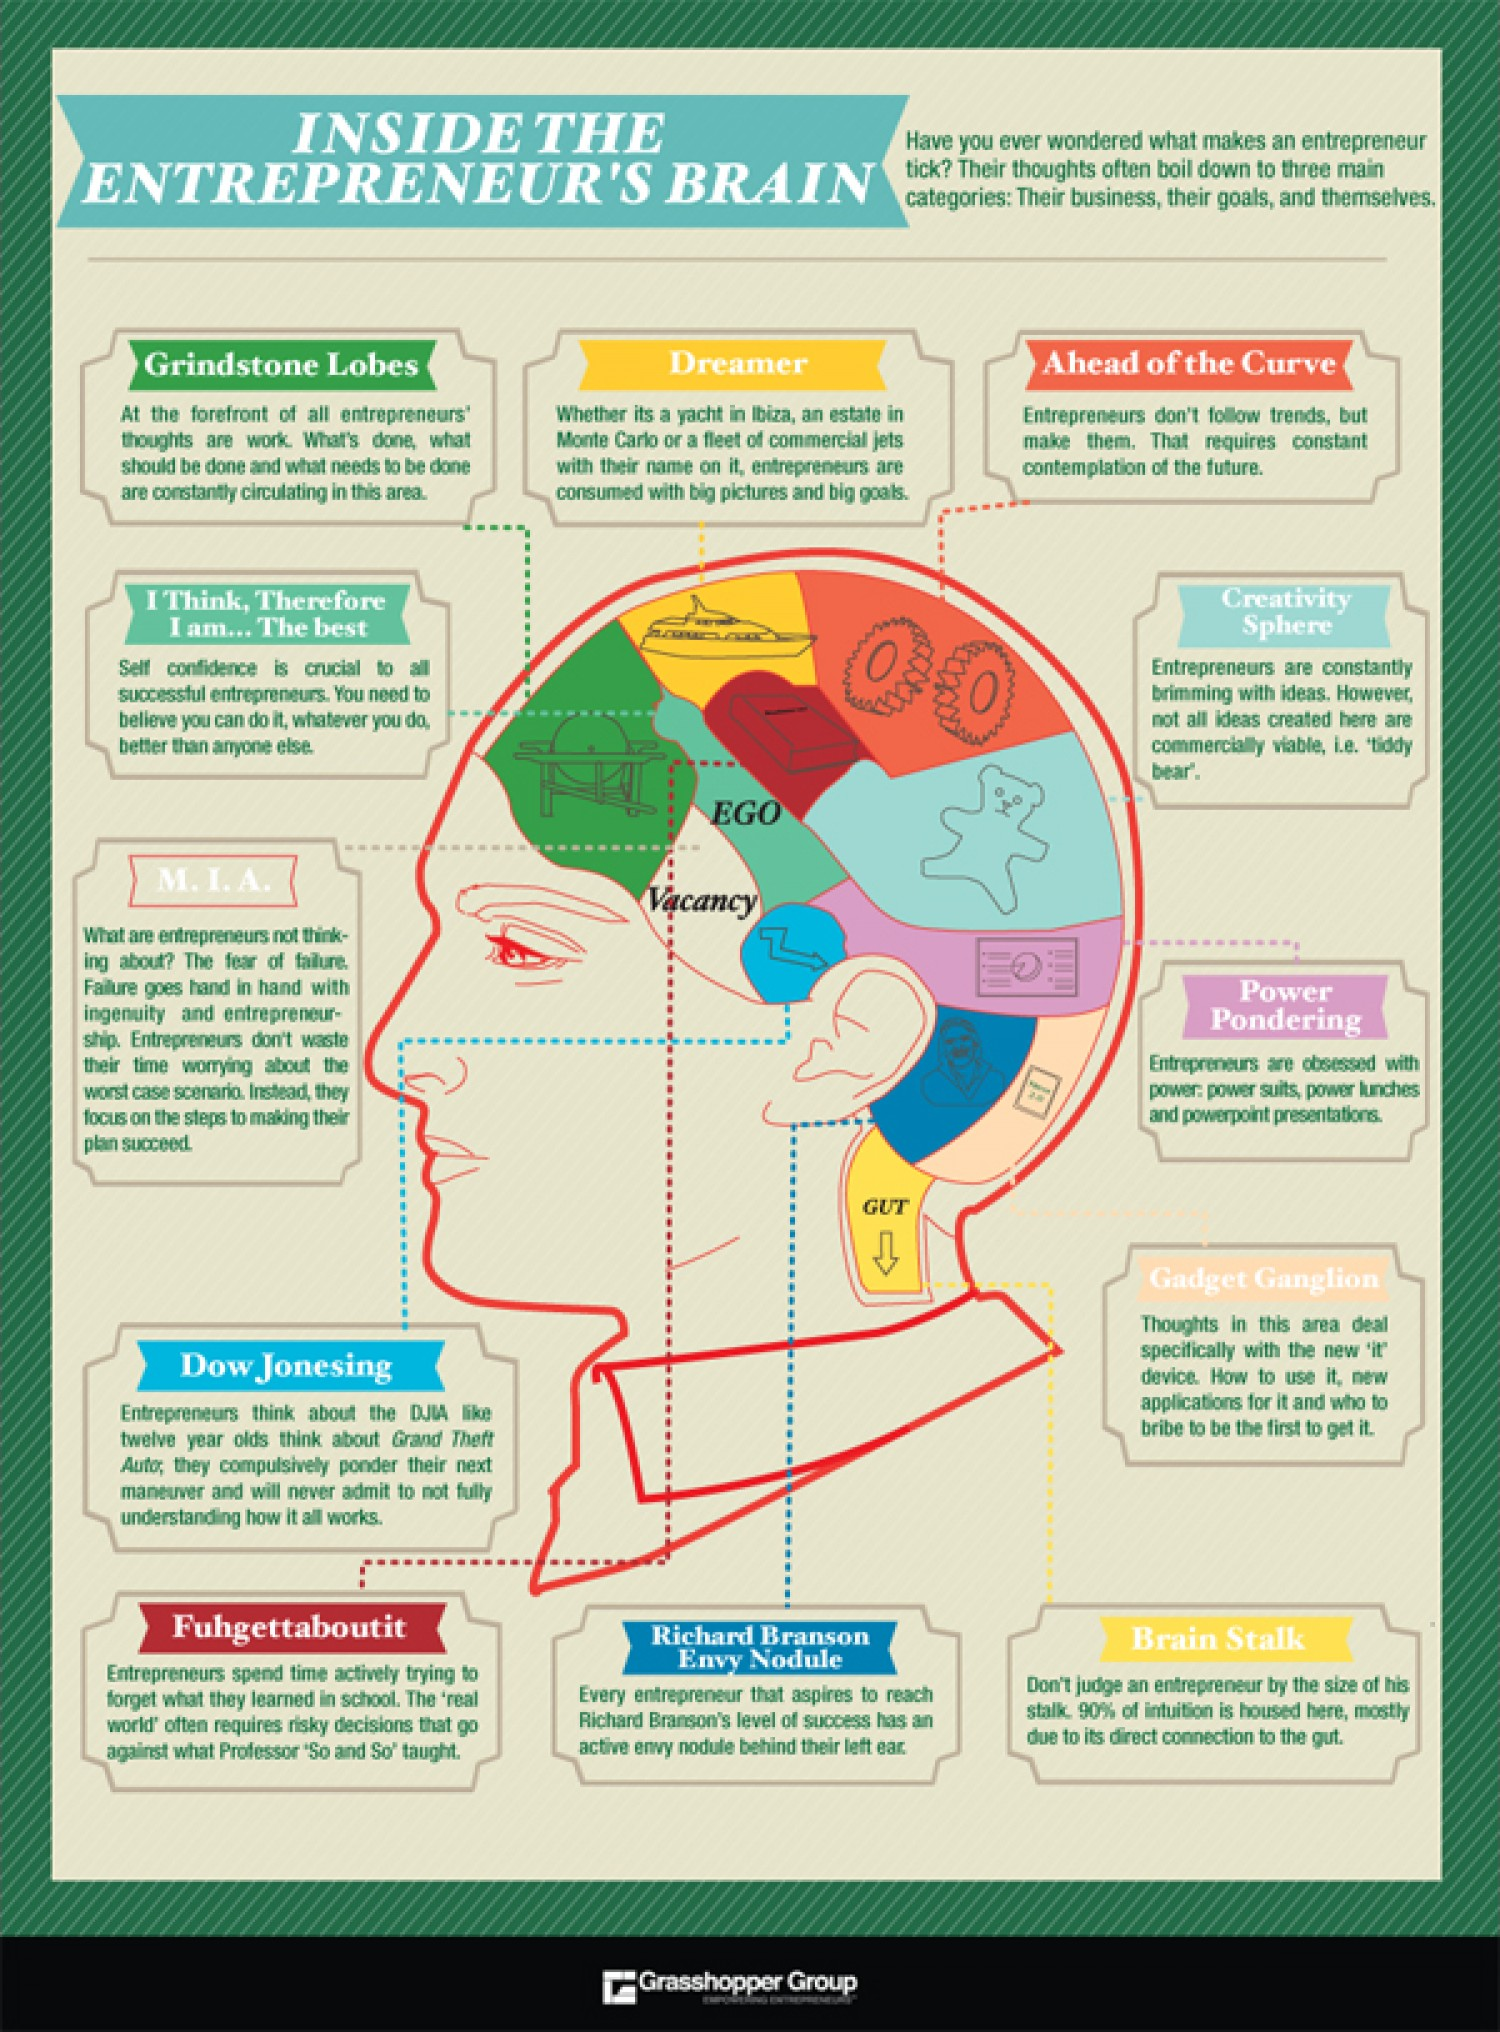 inside-the-entrepreneurs-brain_50290ae0a8597_w1500